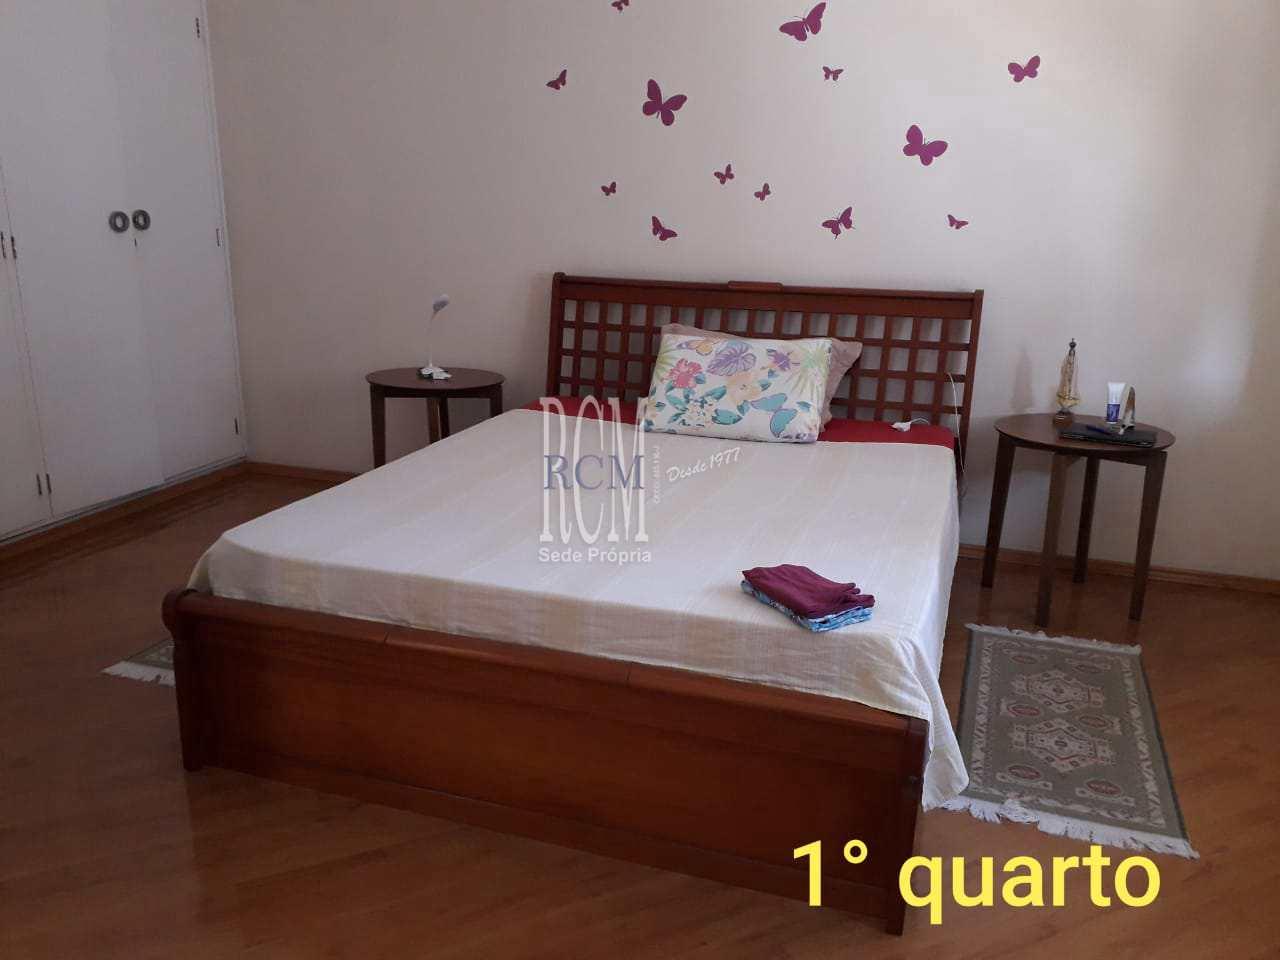 Sobrado com 3 dorms, Vila Valença, São Vicente - R$ 549 mil, Cod: 92279